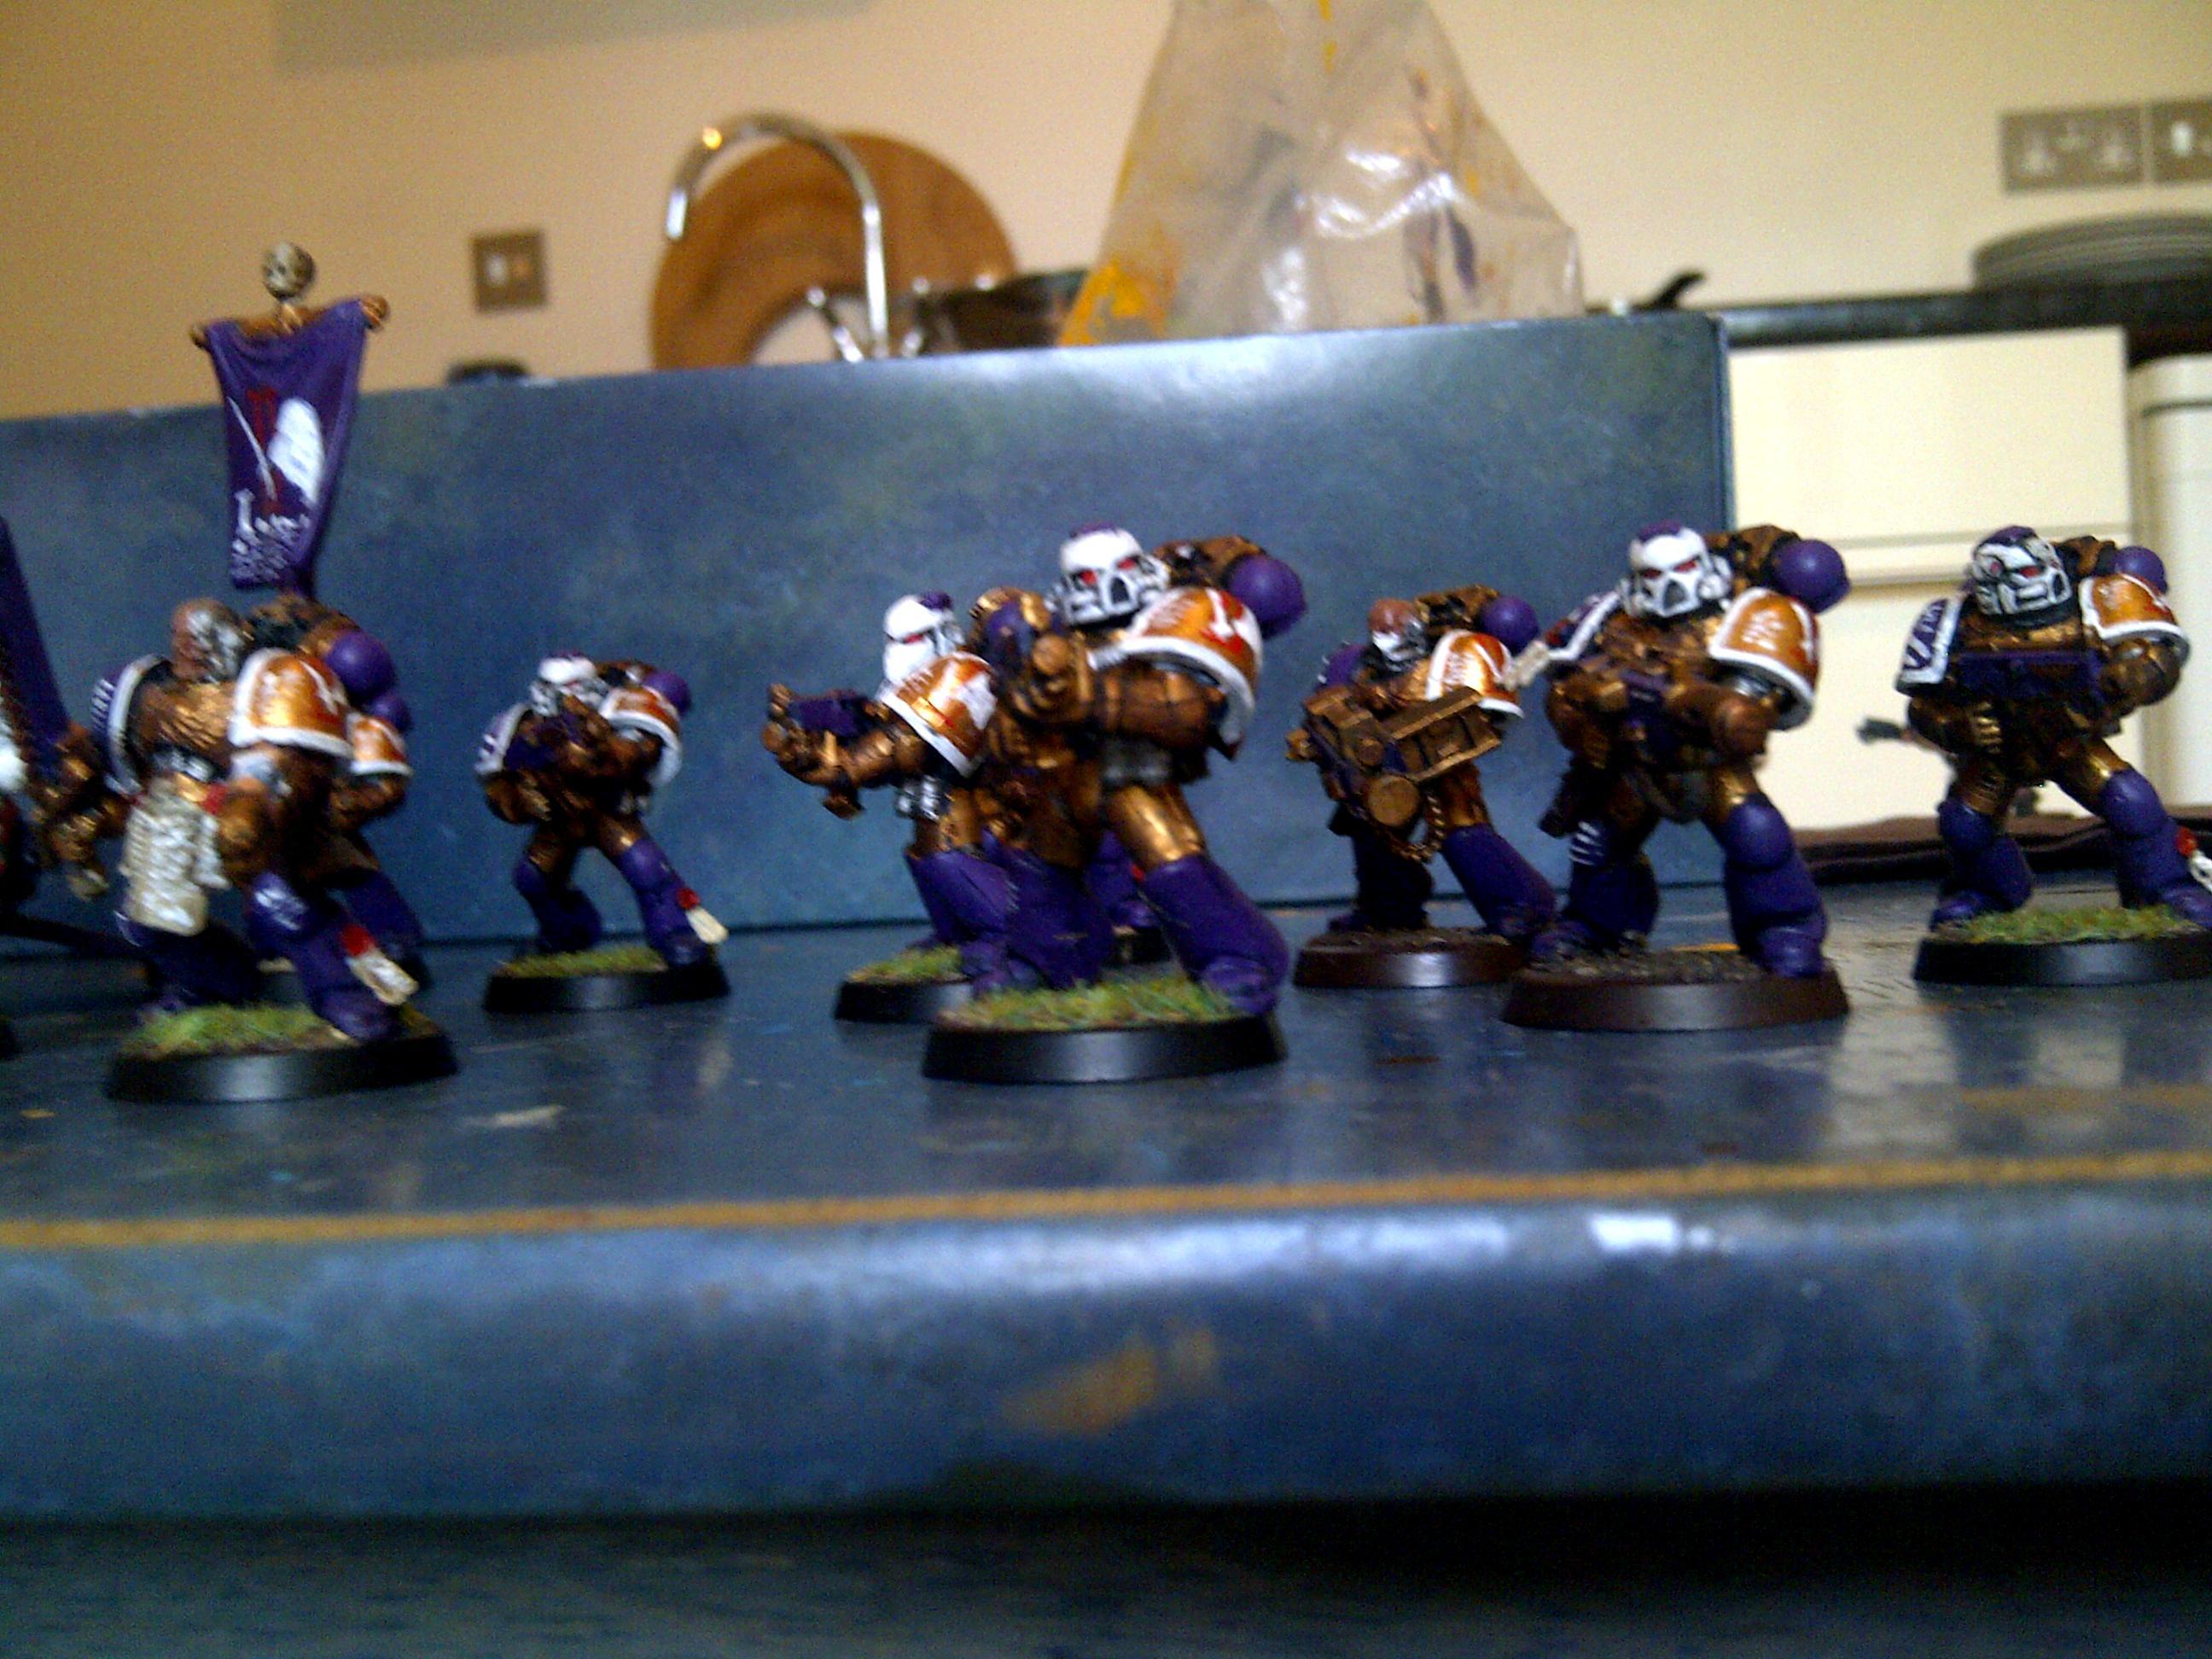 Razorback, Sanguinary Priest, Tactical Squad